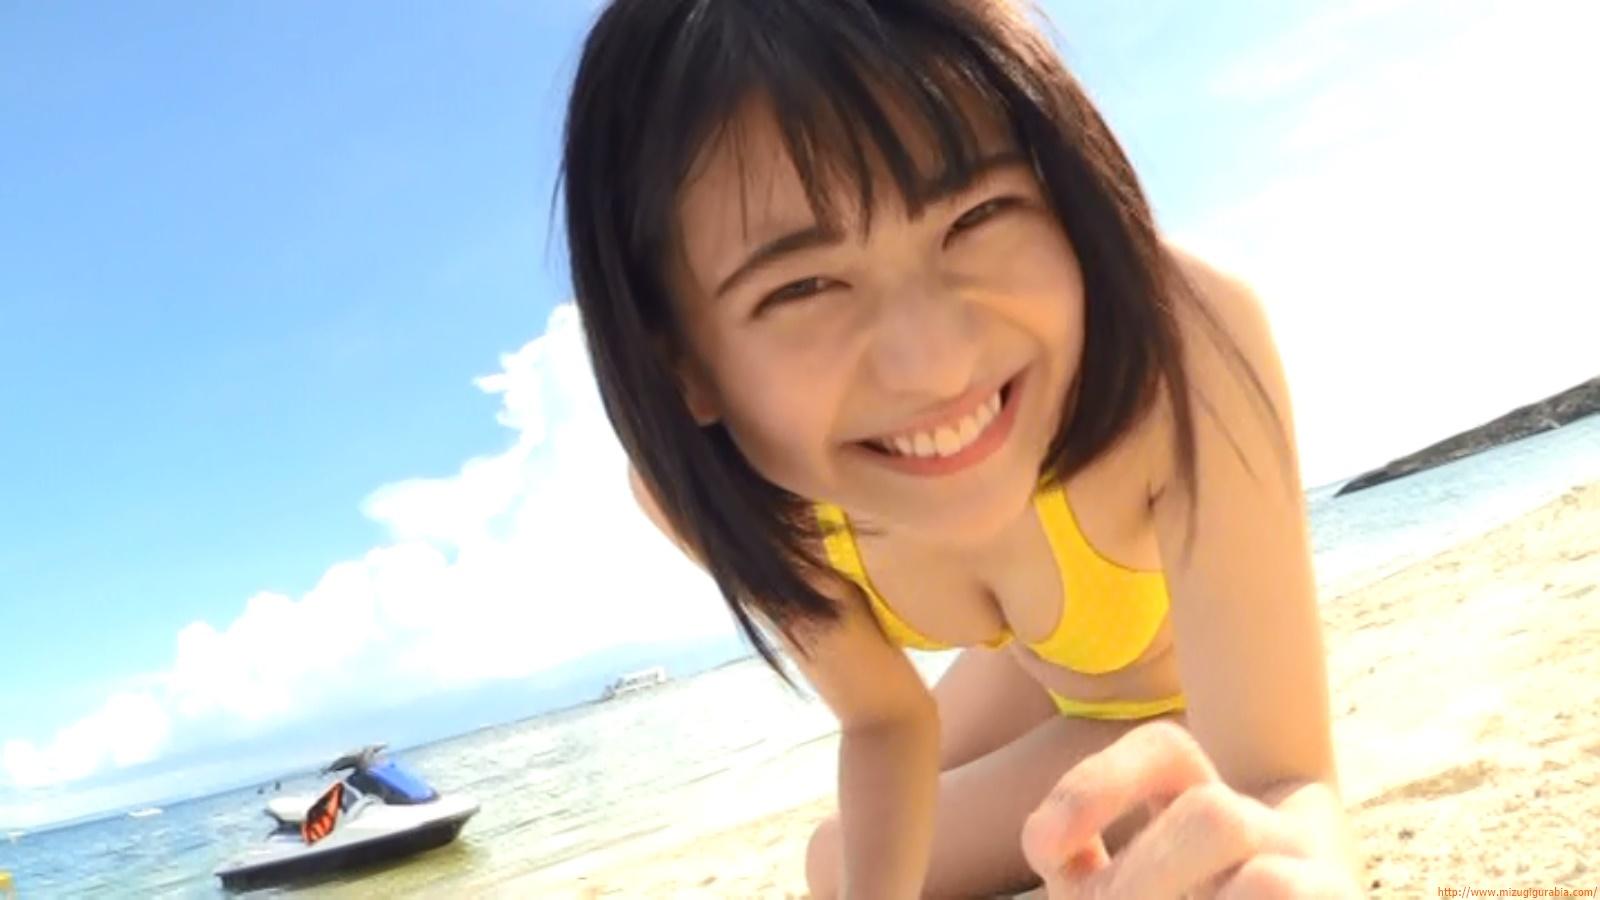 Beach dating237